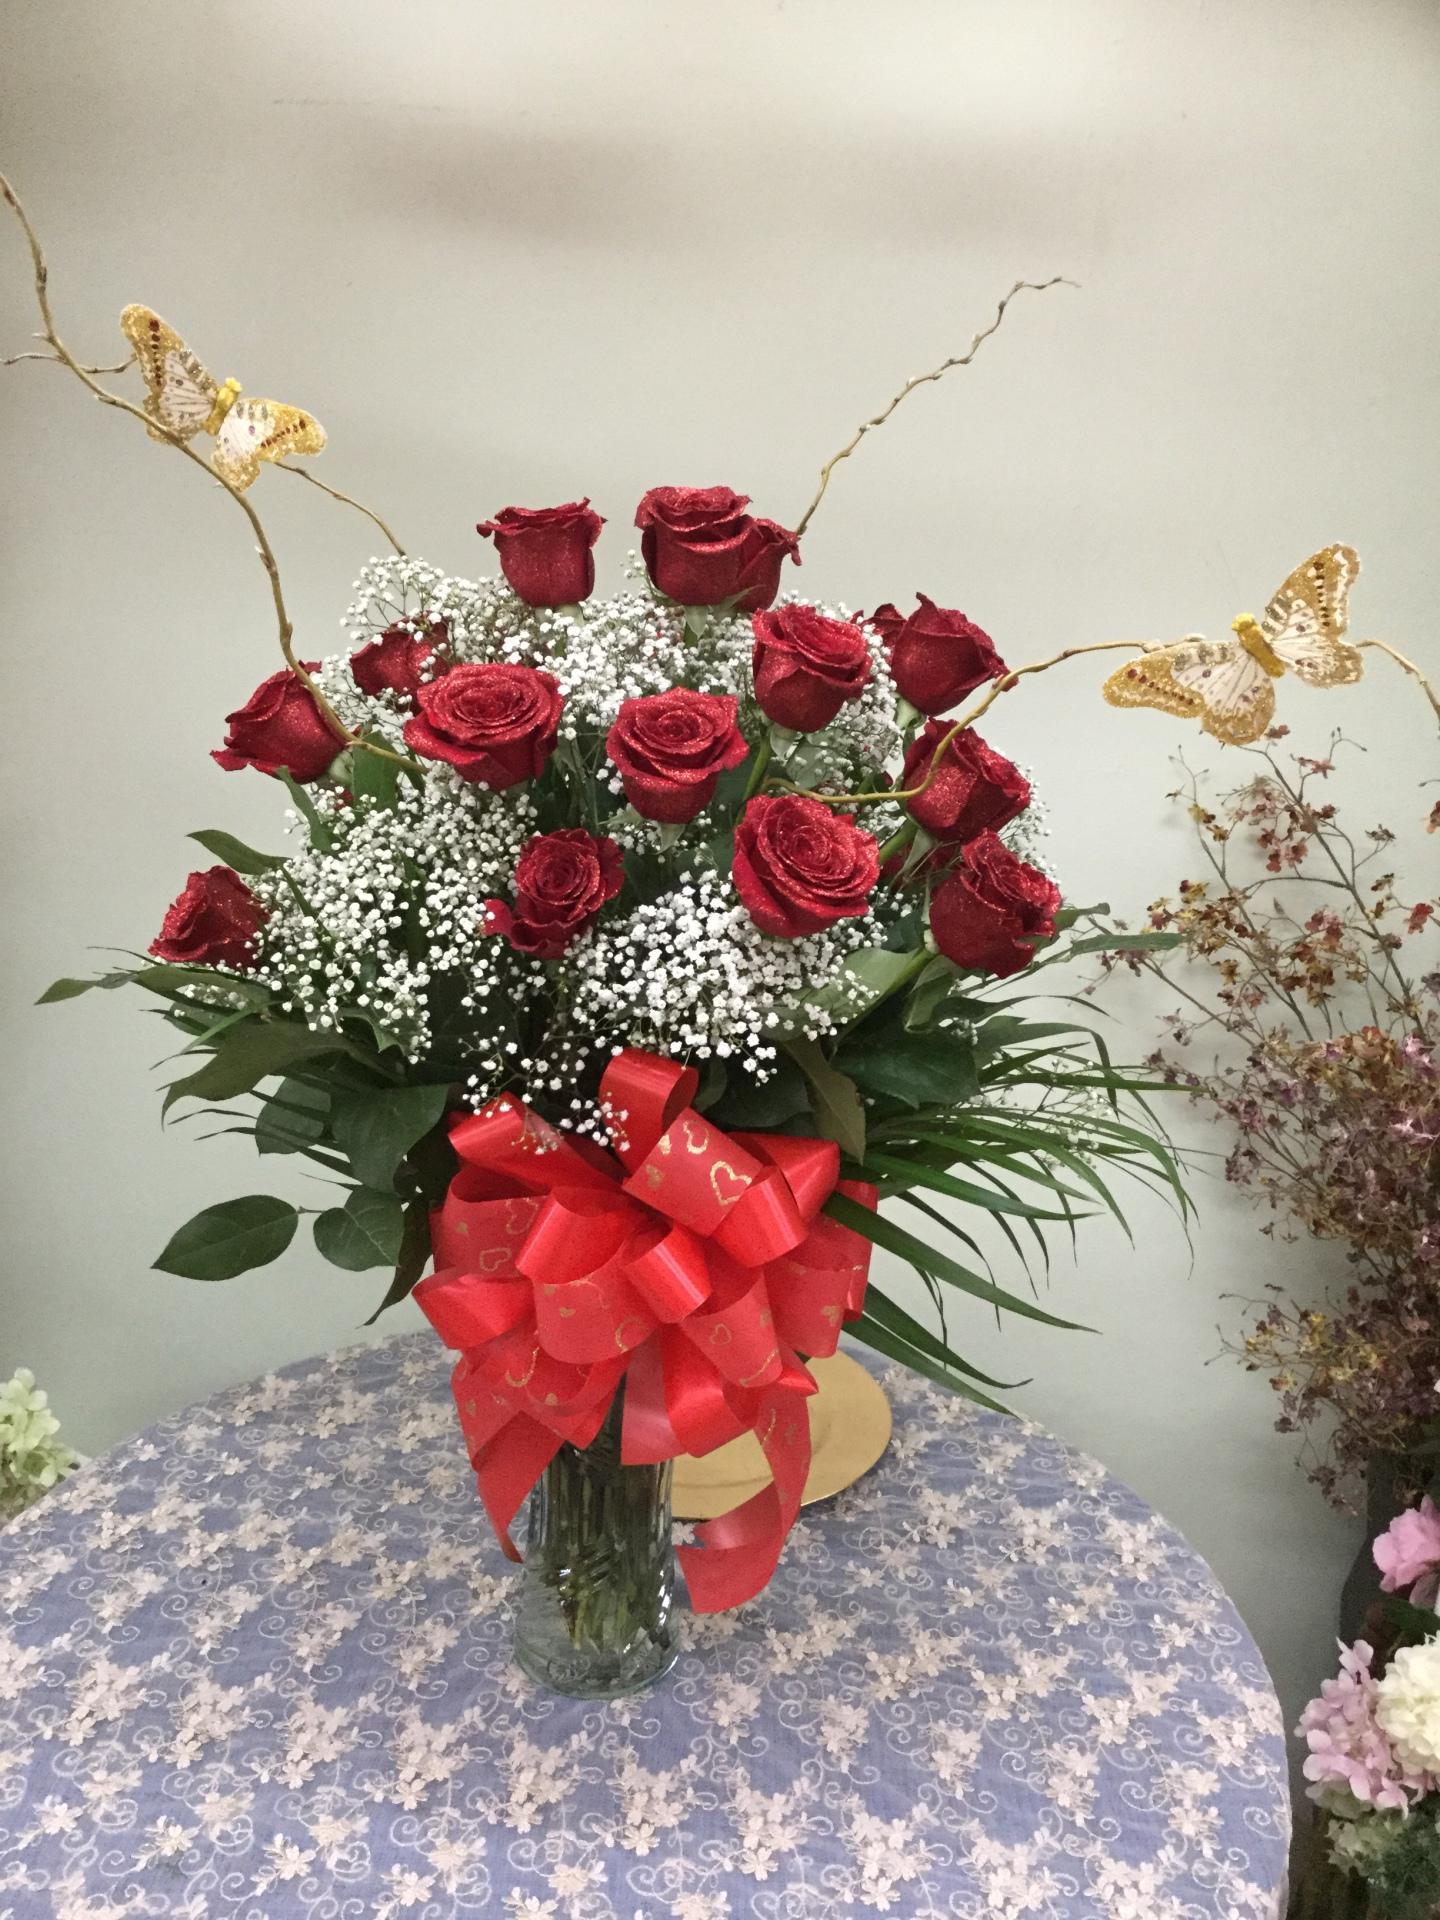 Eighteen Glittered Red Roses - Arrangement in Vase